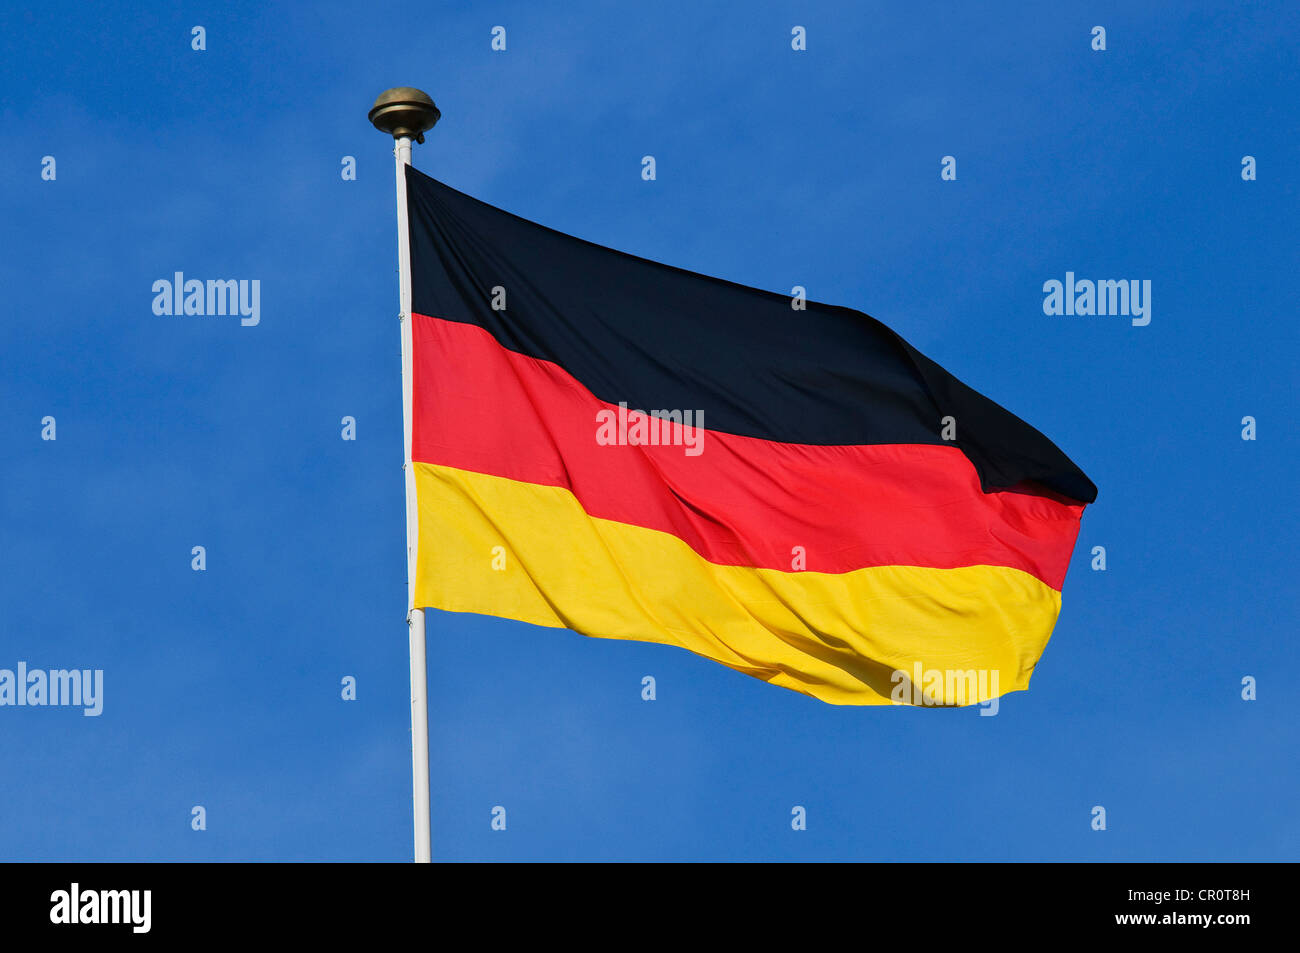 Deutschen Nationalflagge gegen blauen Himmel Stockbild